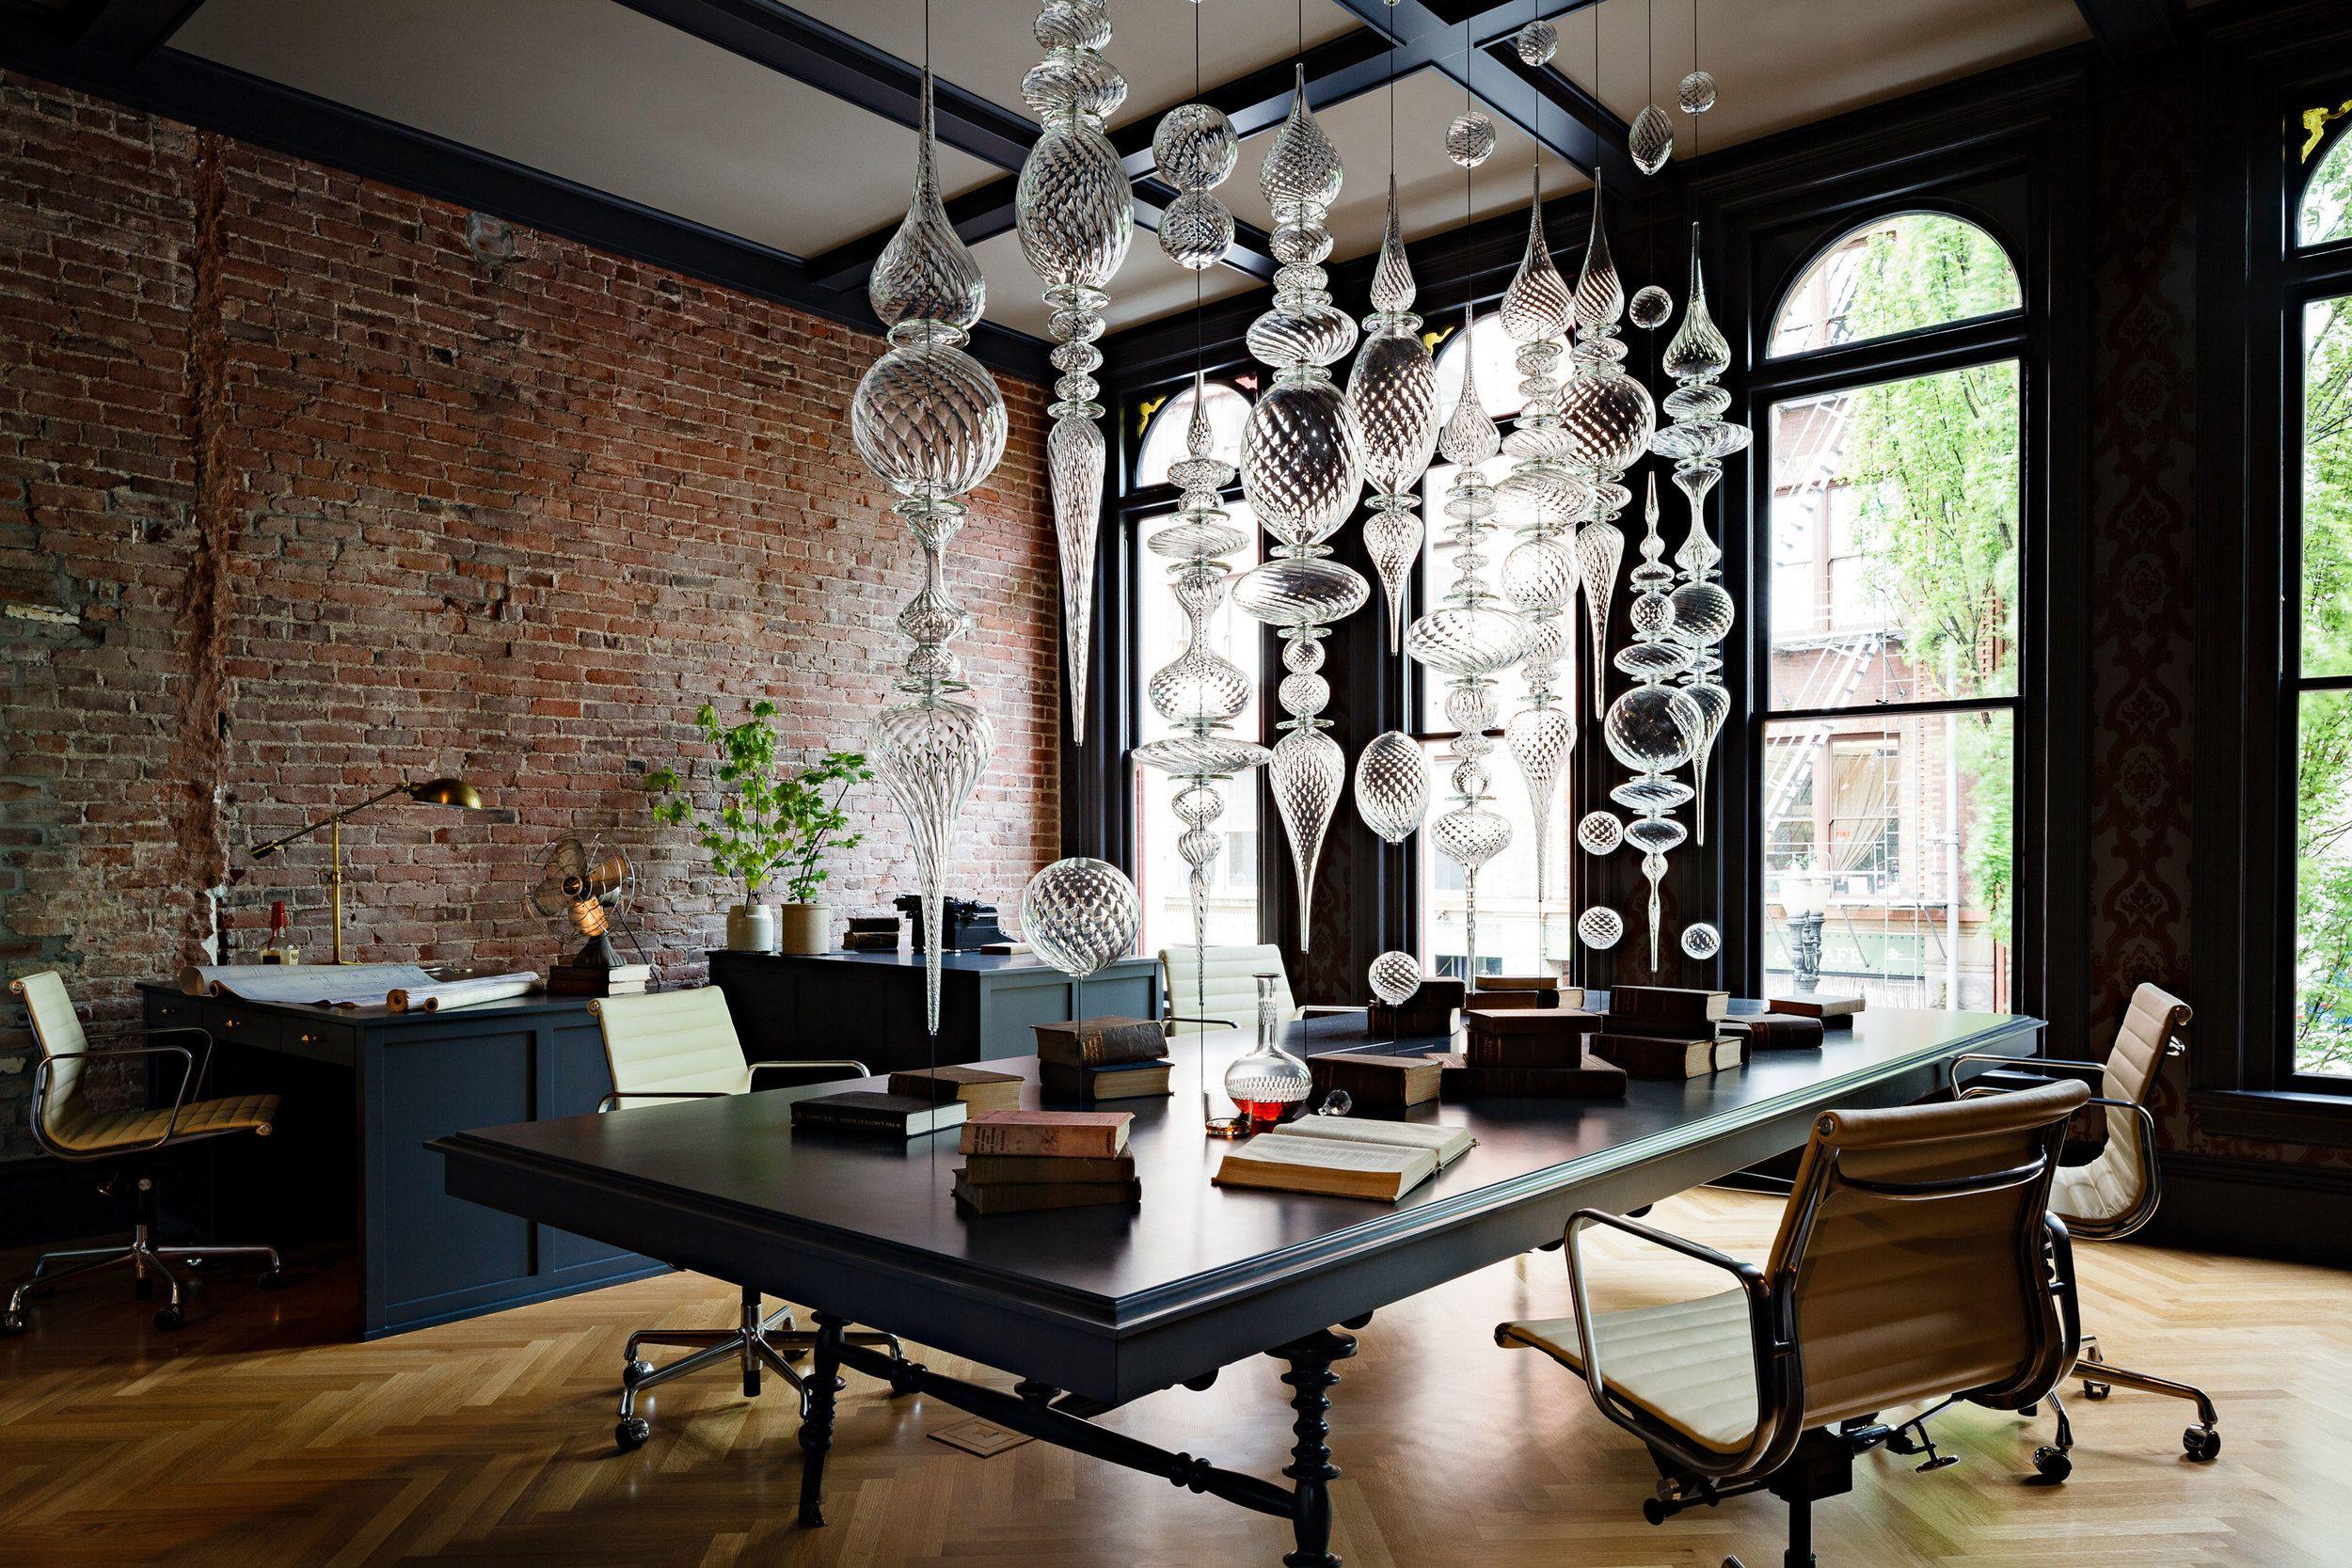 jessica helgerson interior design 112 sw 1st ave portland or